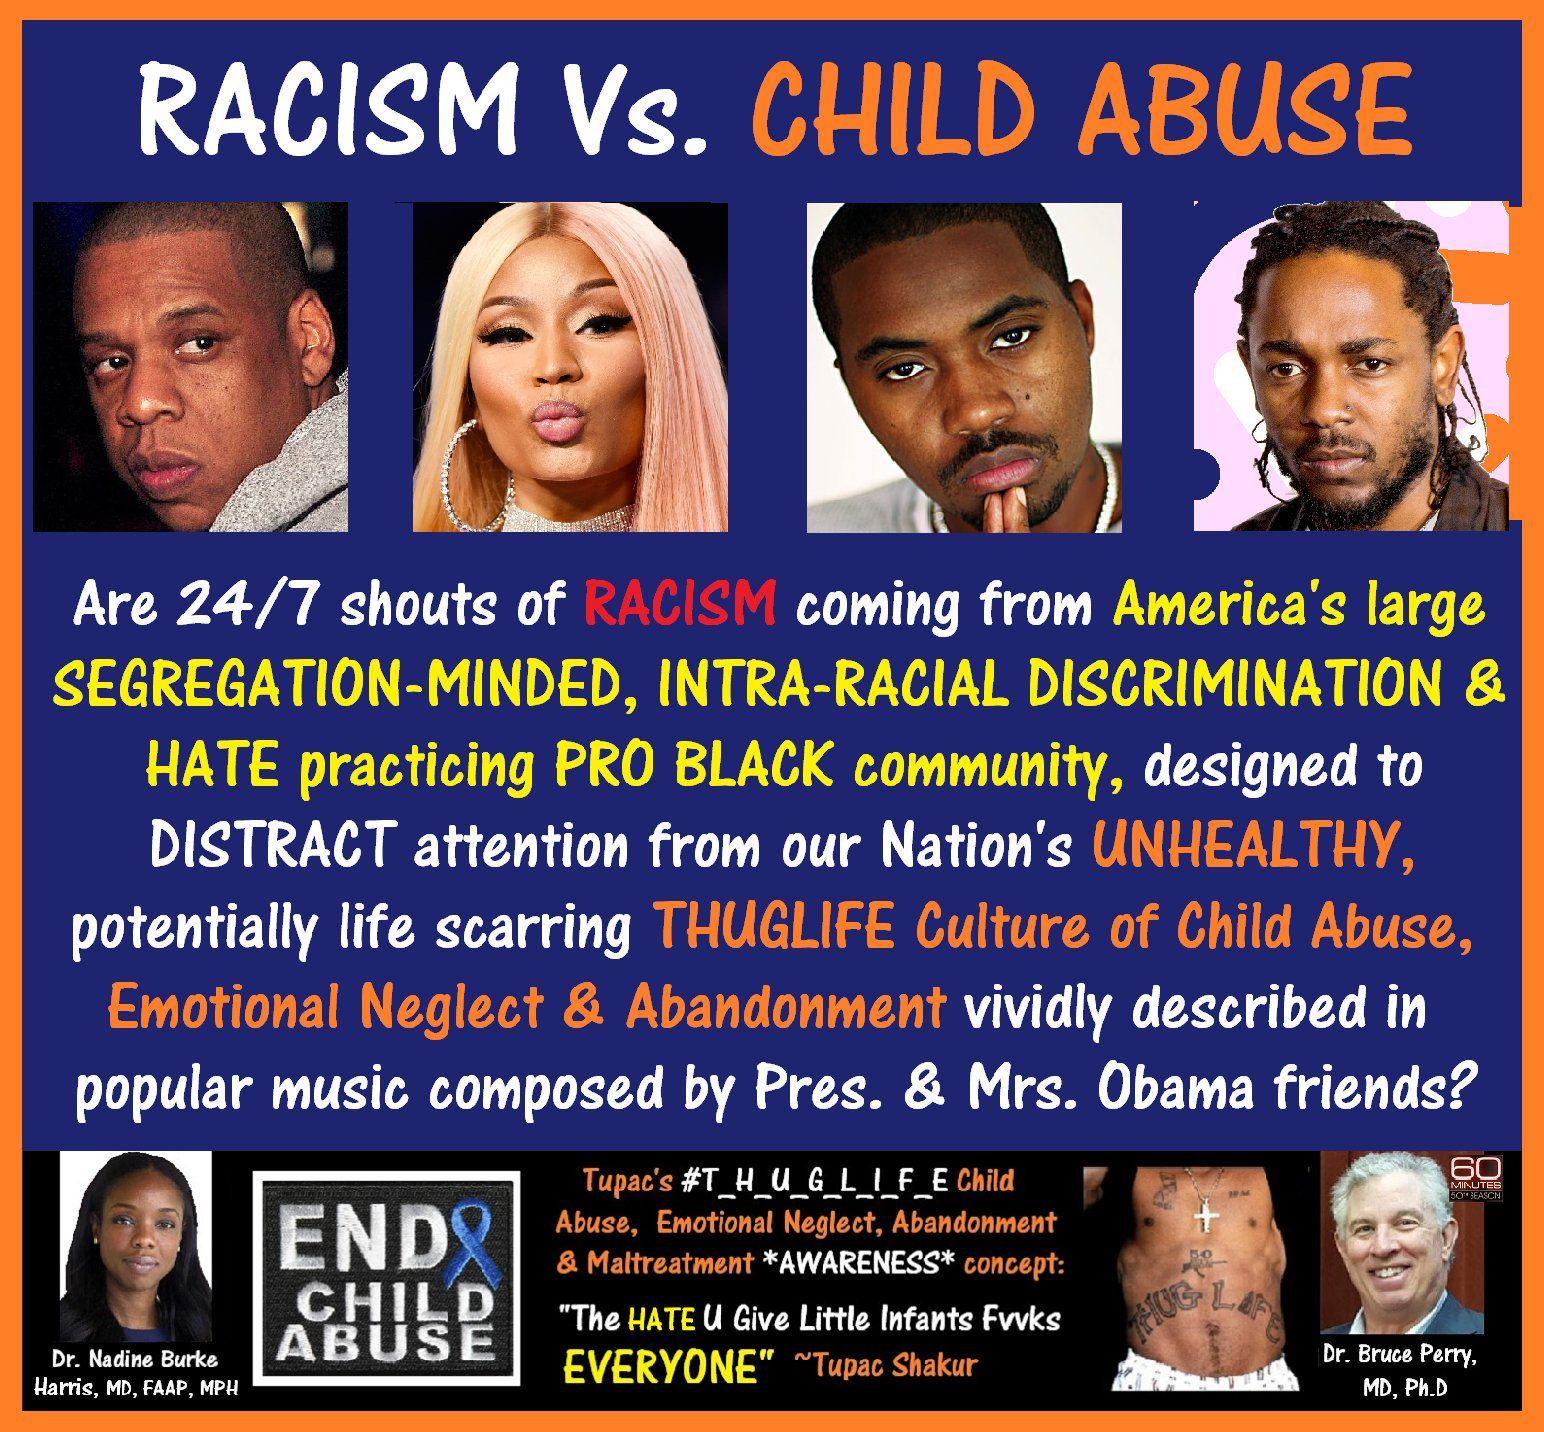 Racism_Obama_Abuse.jpg